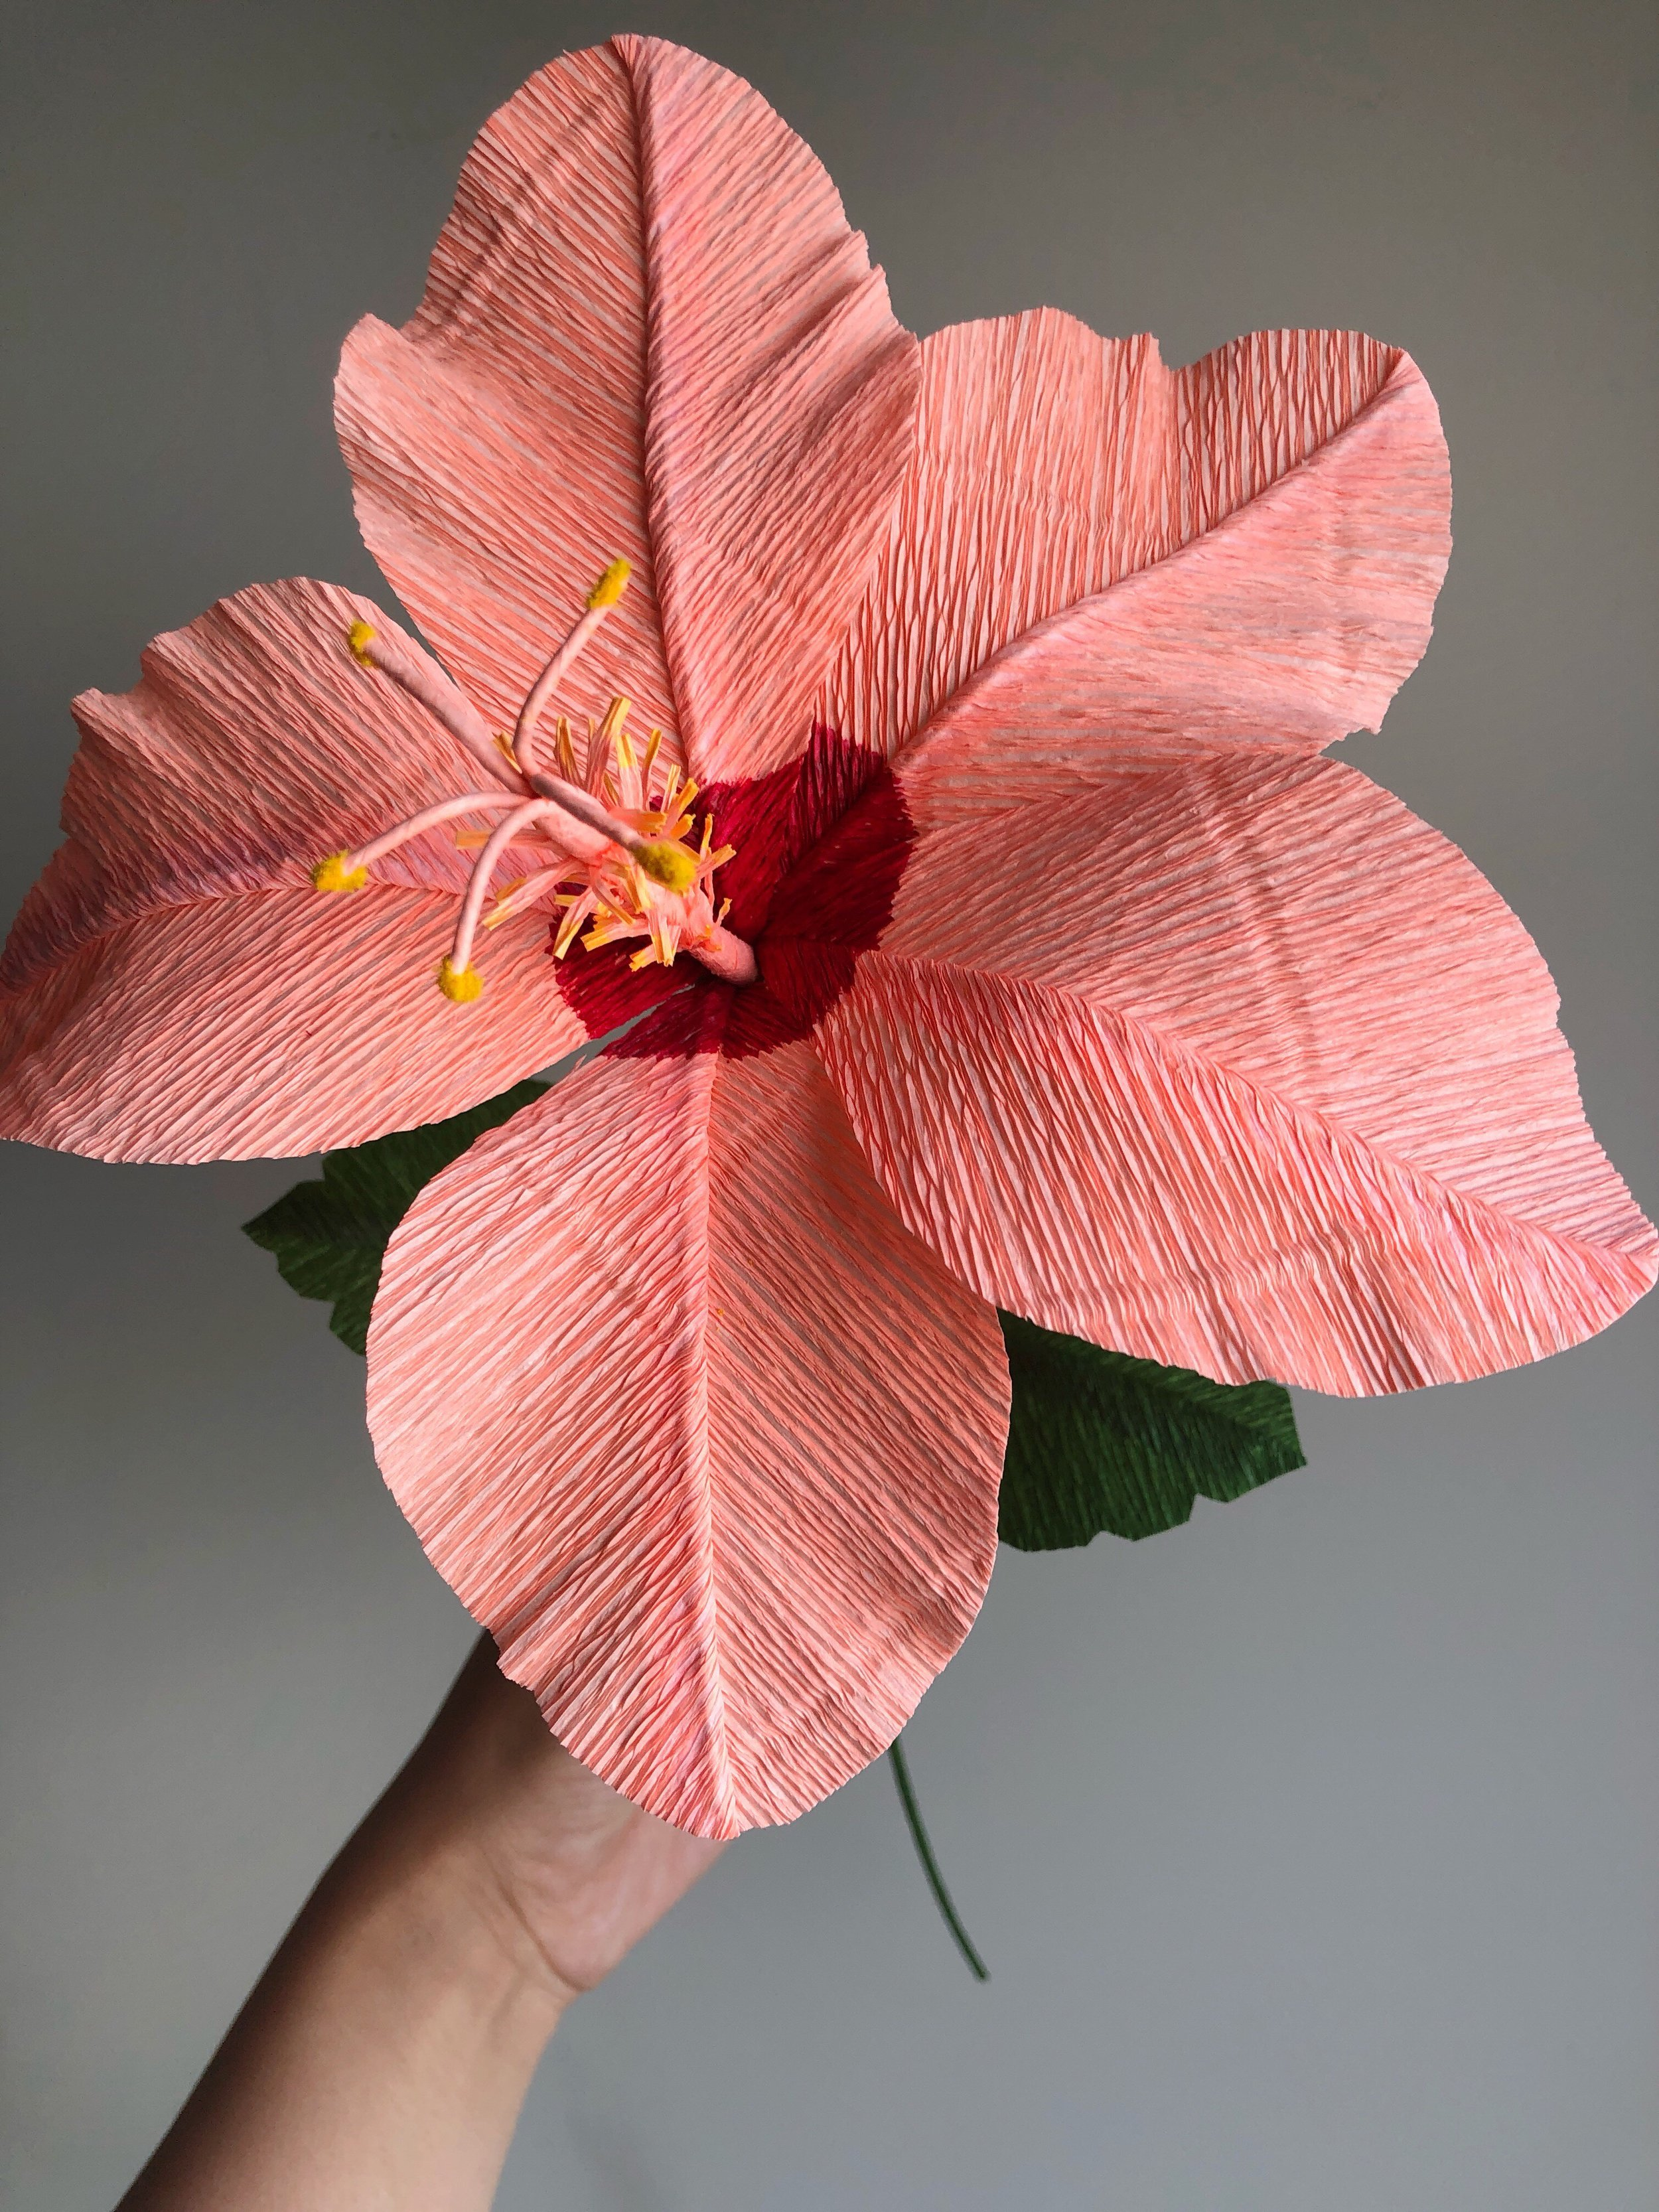 revery-flora-steadfastsupply-hibiscus03.jpeg